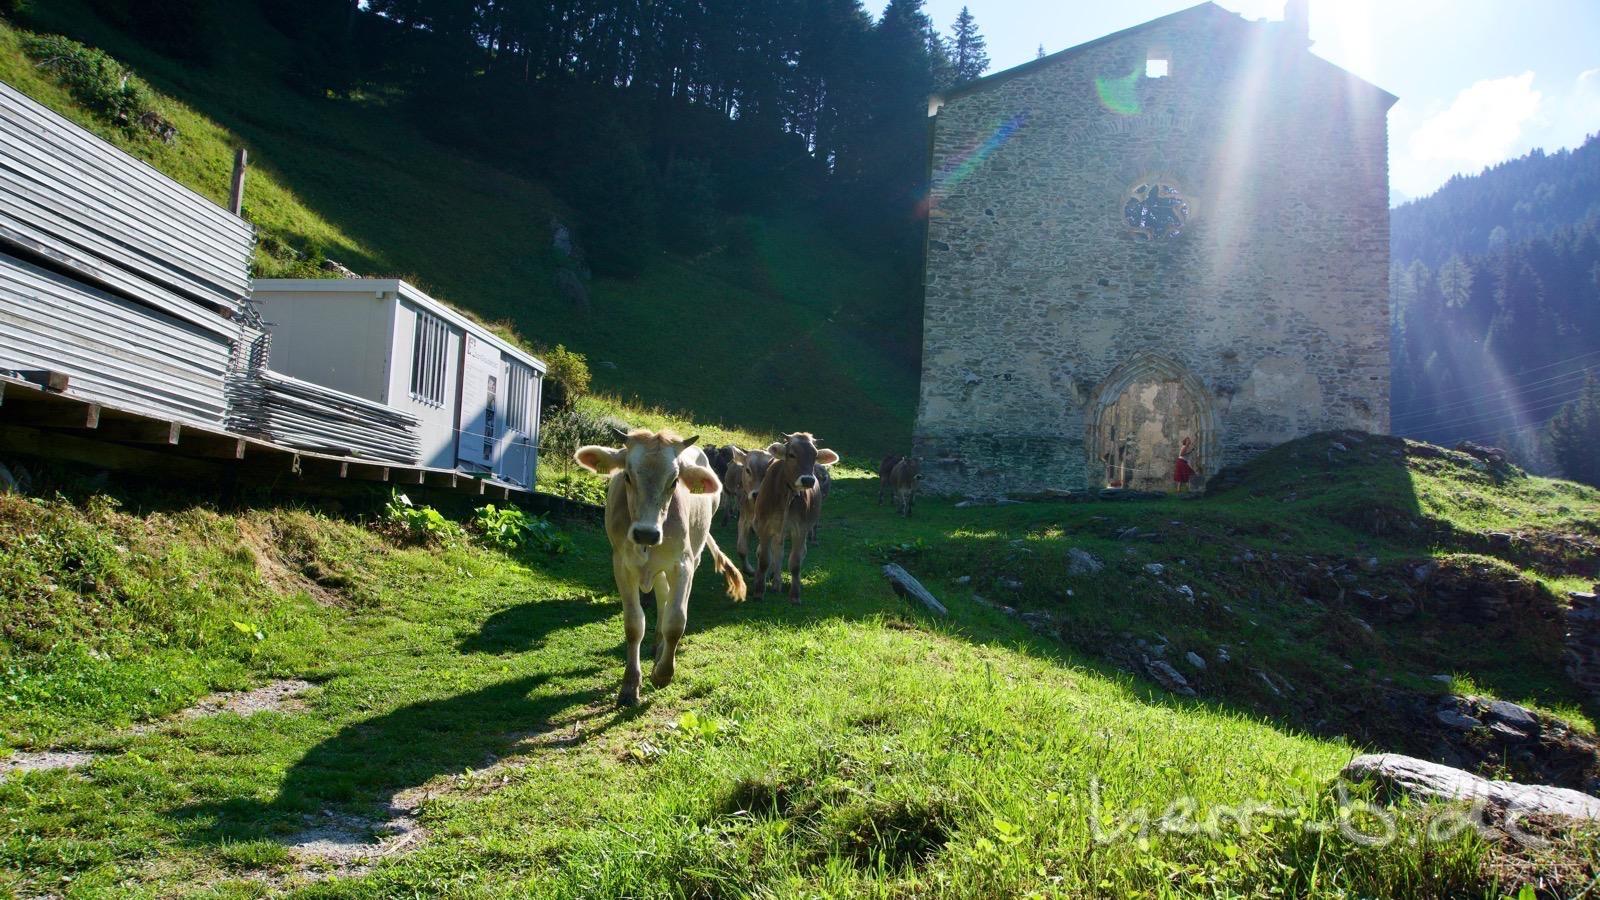 Neugierige Rinder kurz unterhalb vom Malojapass.